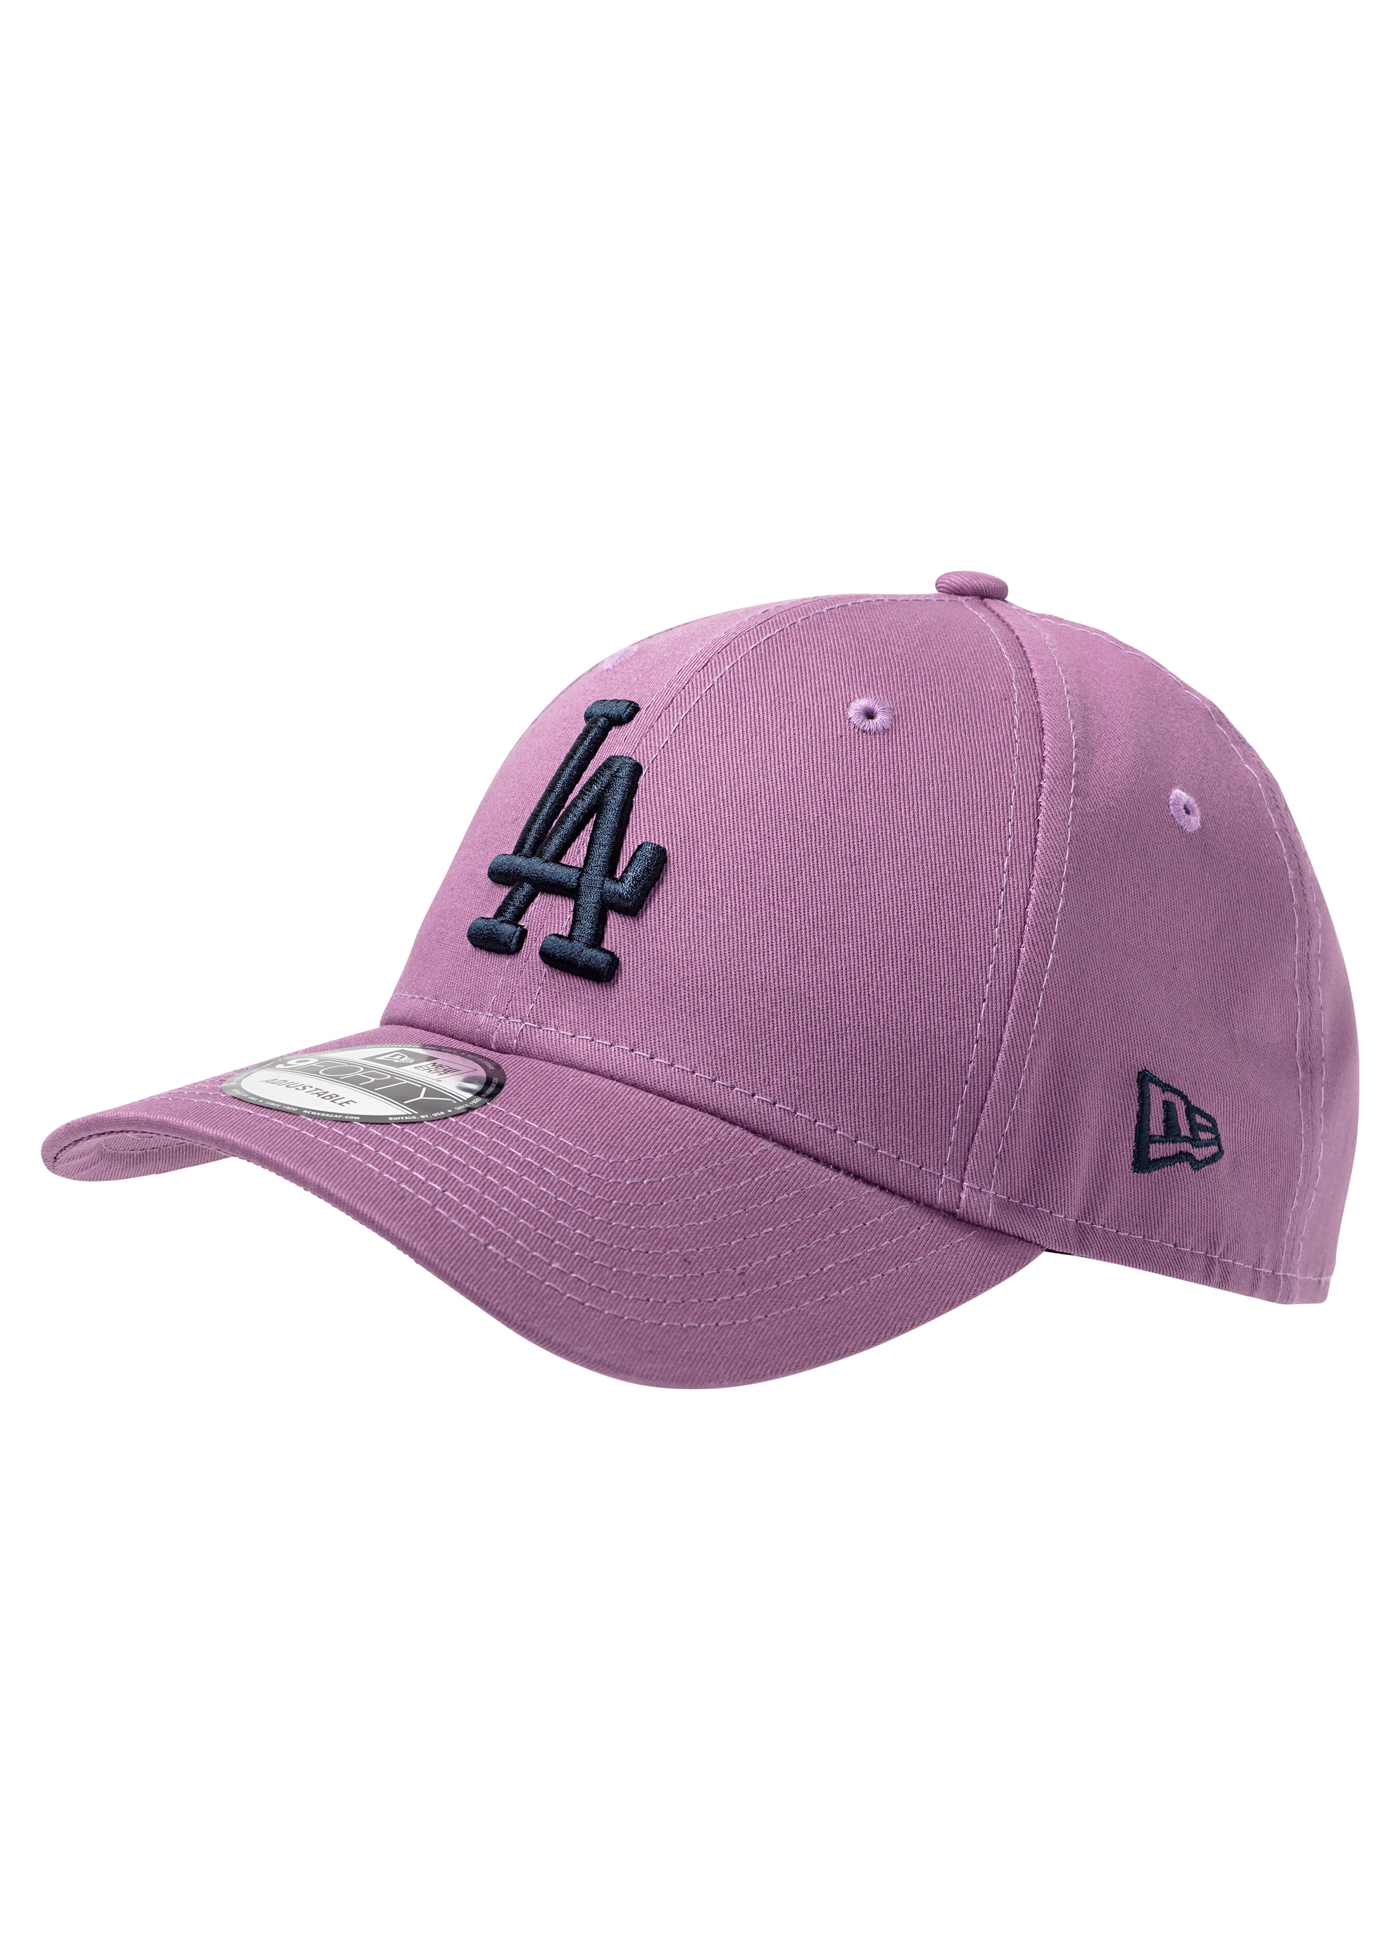 940 MLB PROPERTIES LOS ANGELES DODGERS image number 0